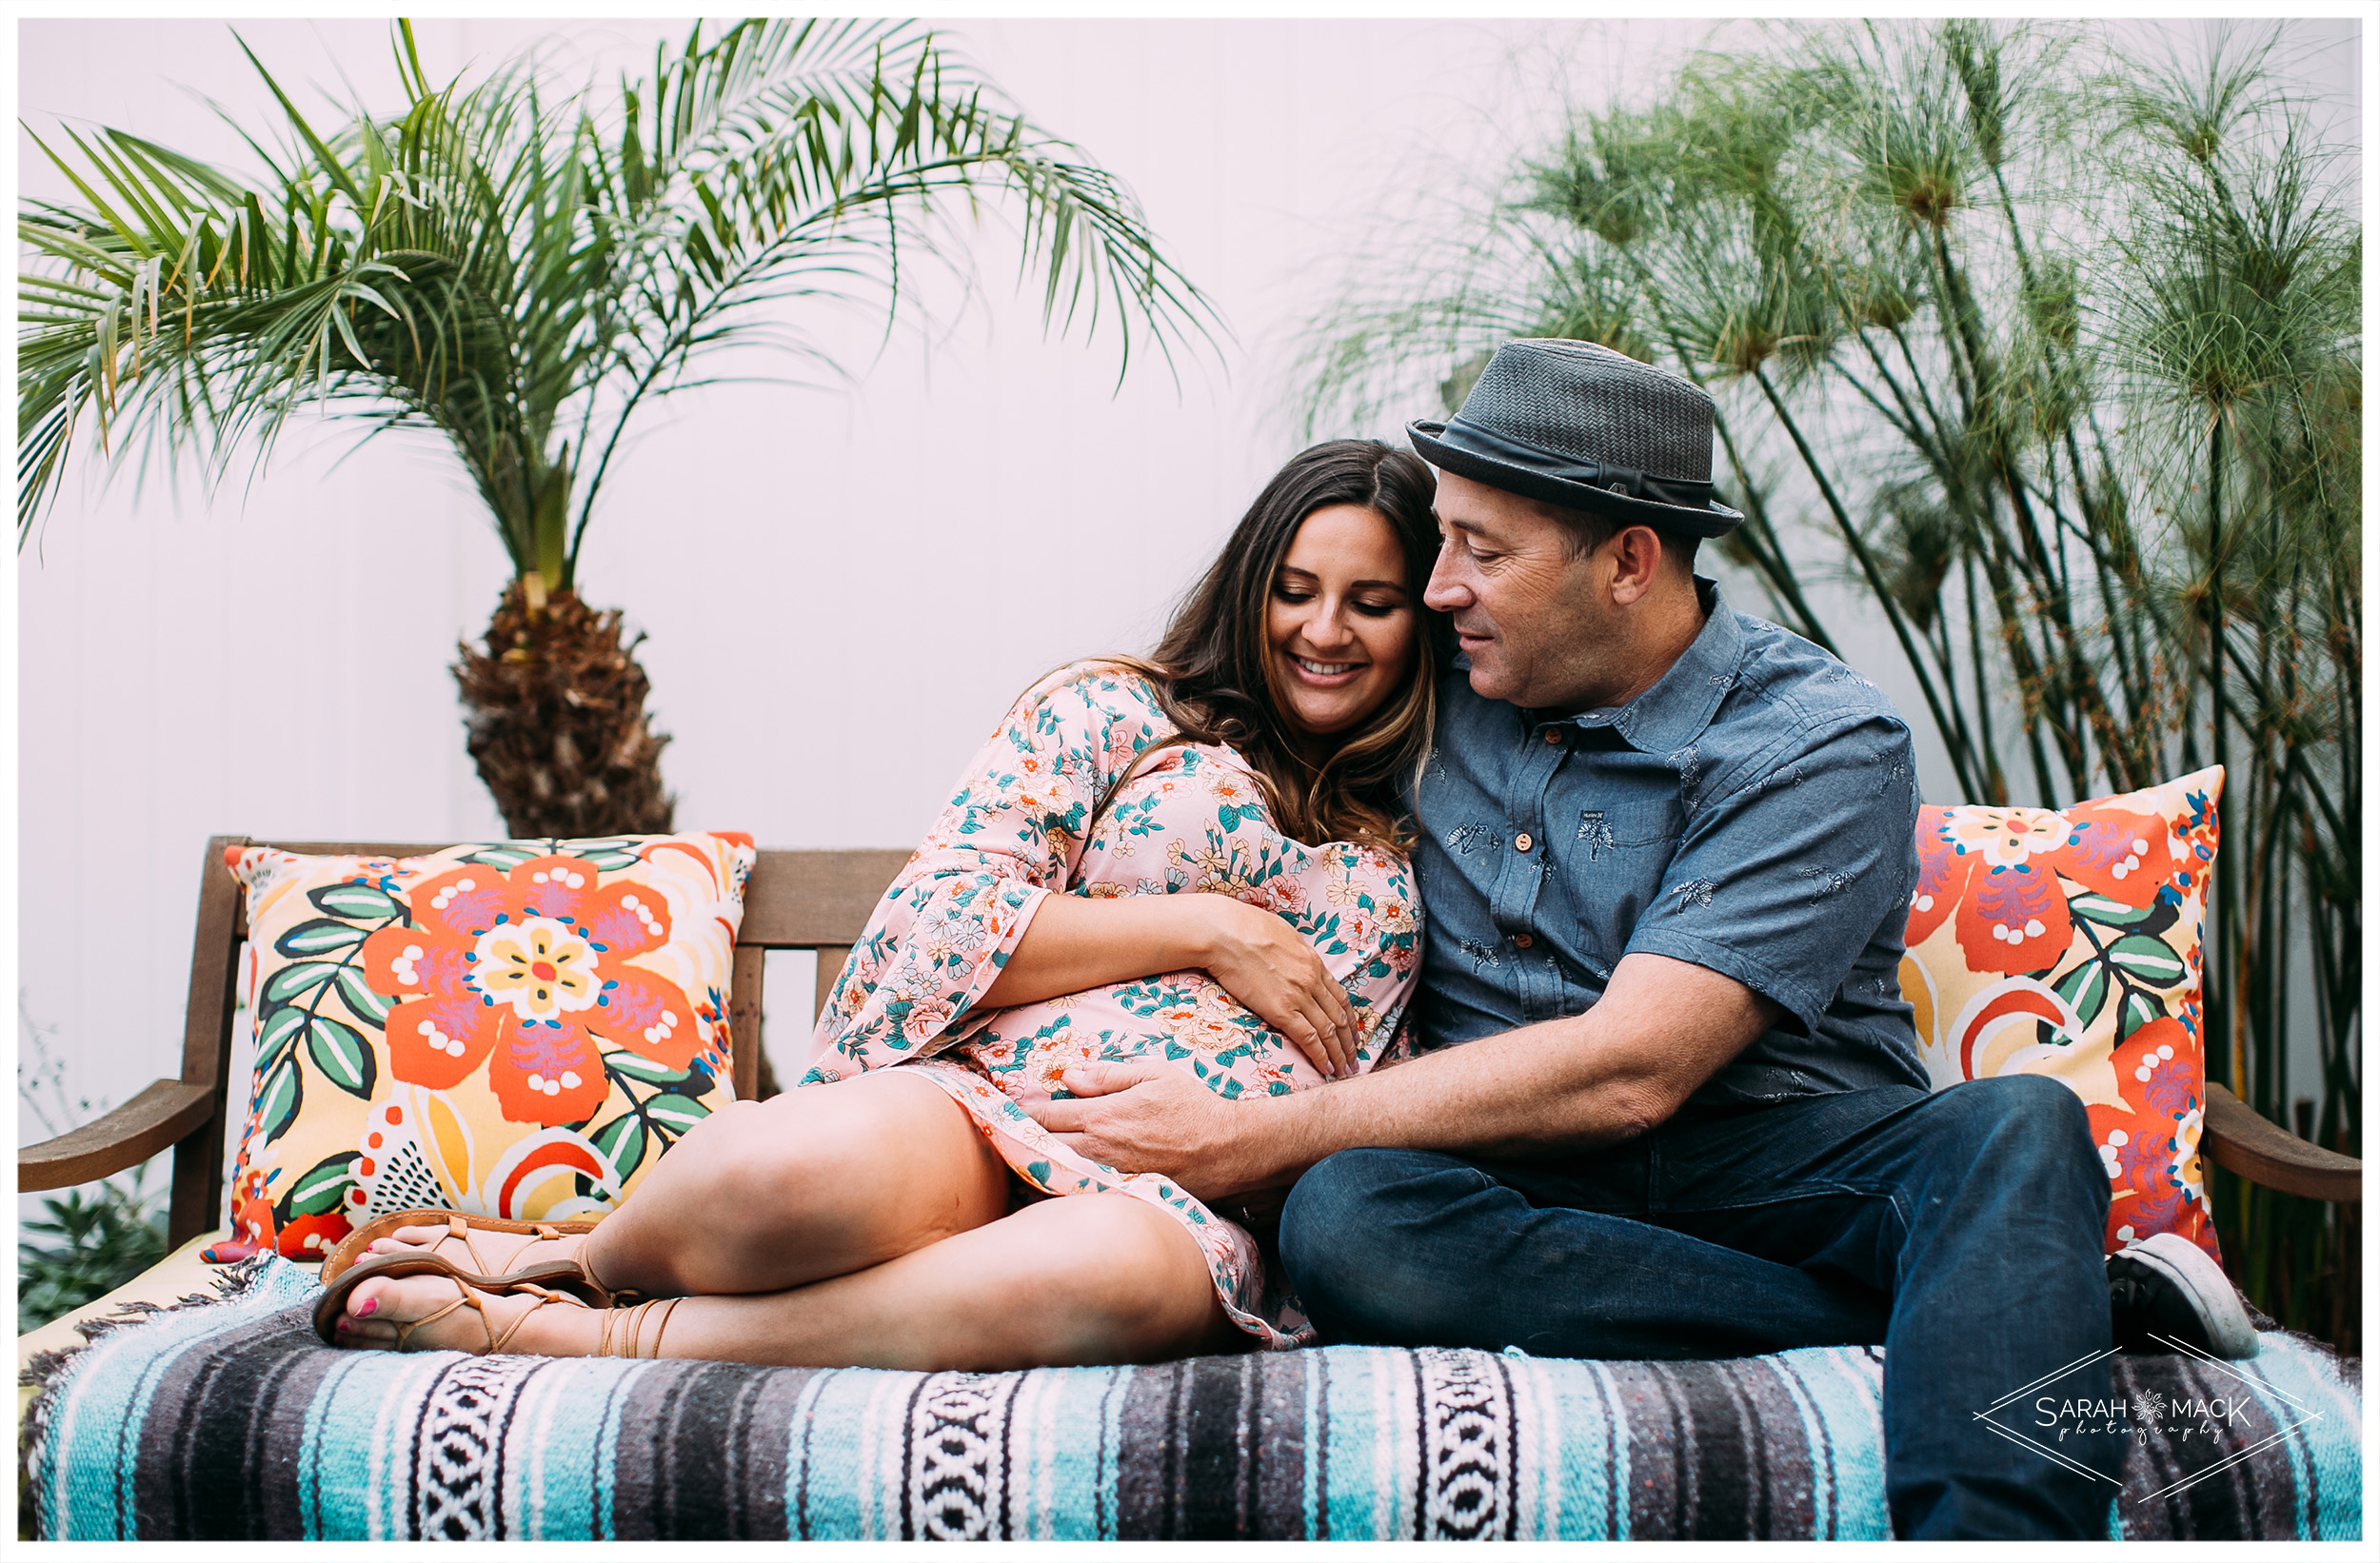 costa-mesa-home-maternity-photography-12.jpg